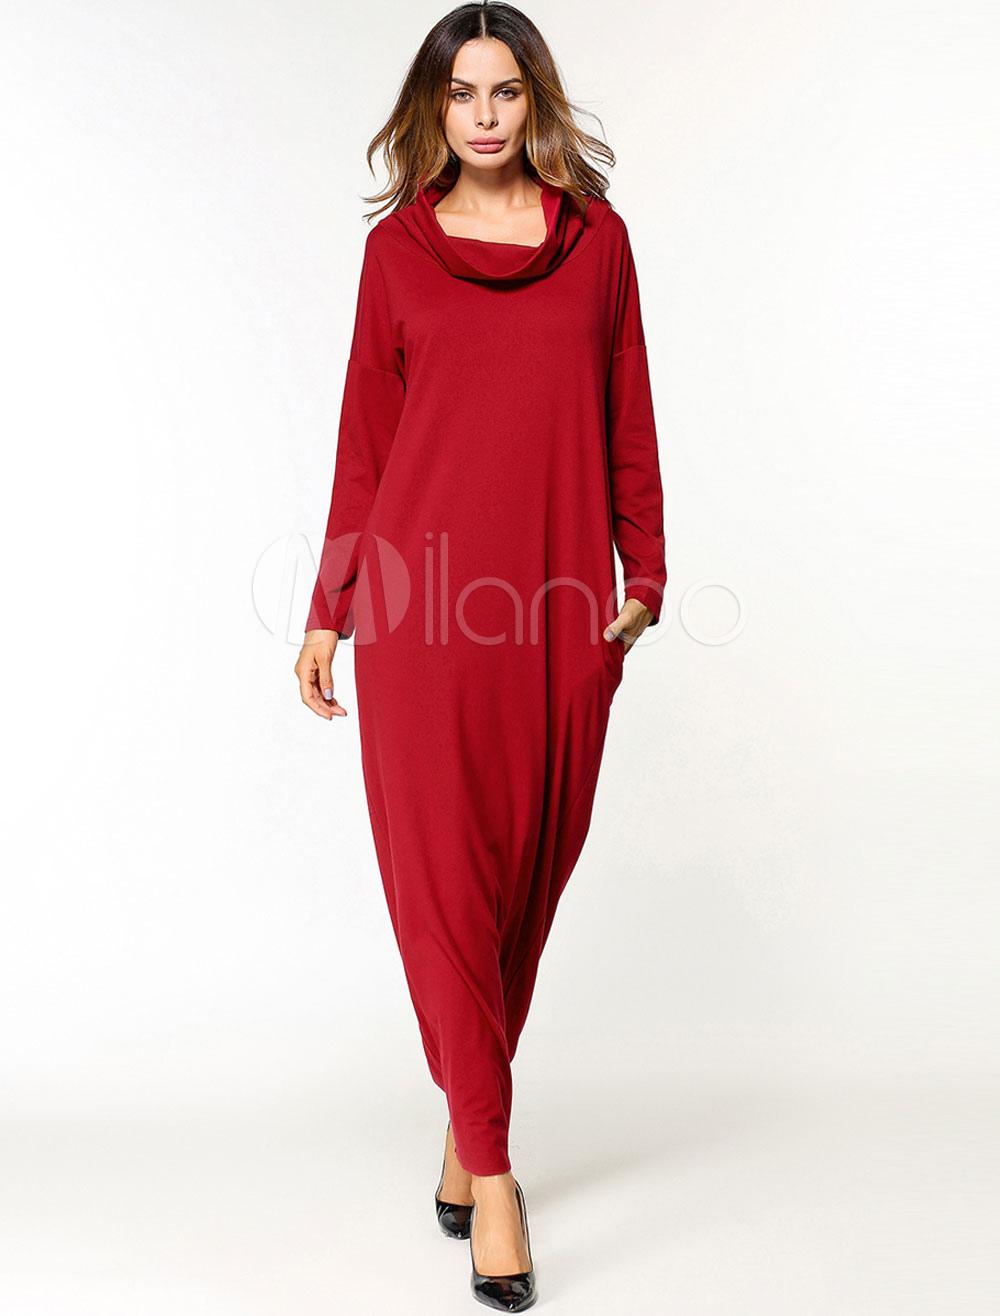 Red Kaftan Dress Women Long Sleeve Pockets Turtleneck Maxi Dress (Women\\'s Clothing Arabian Clothing) photo